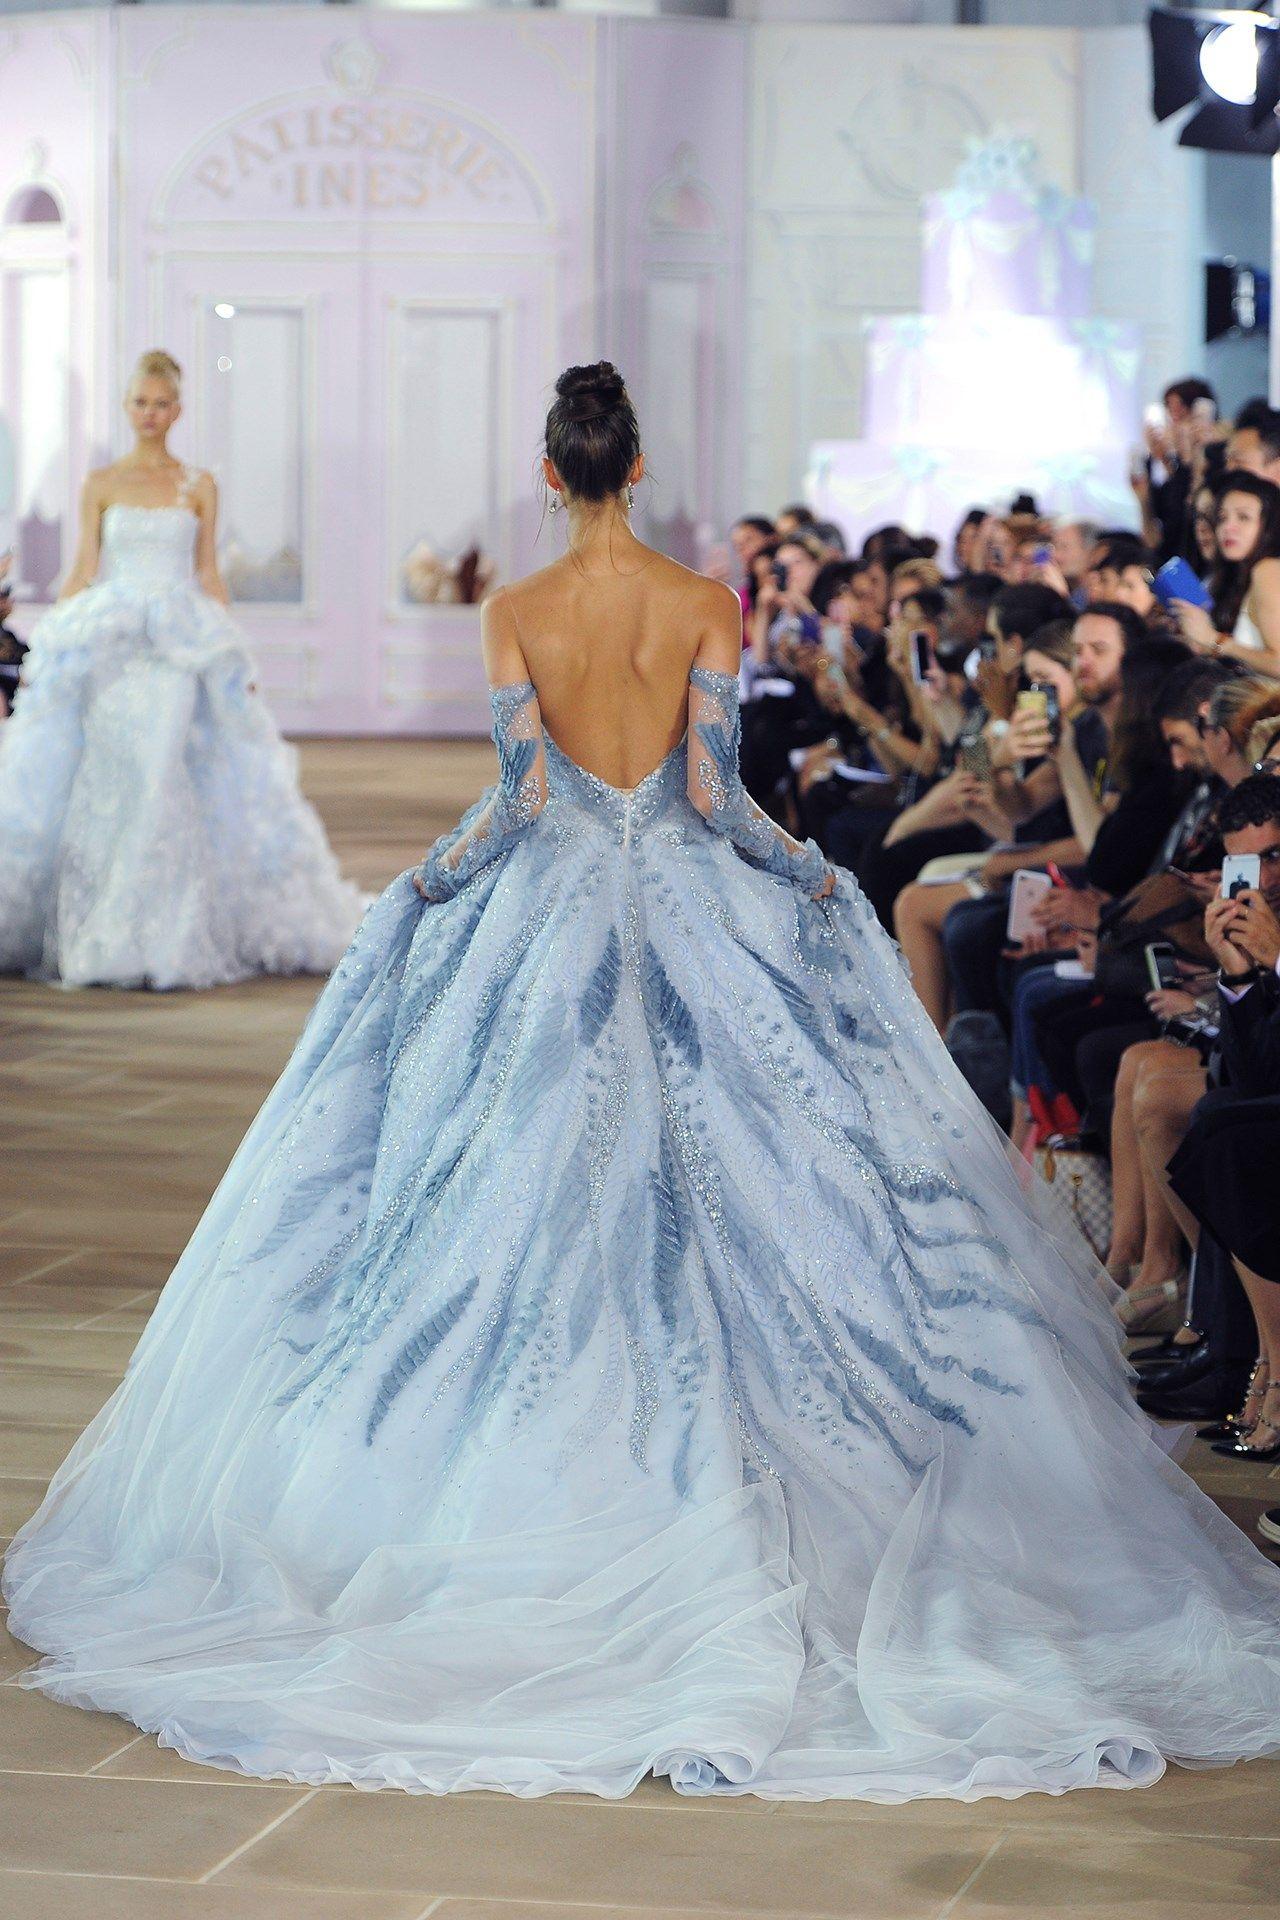 74 Princess Wedding Dresses And Ball Gowns | Princess wedding ...